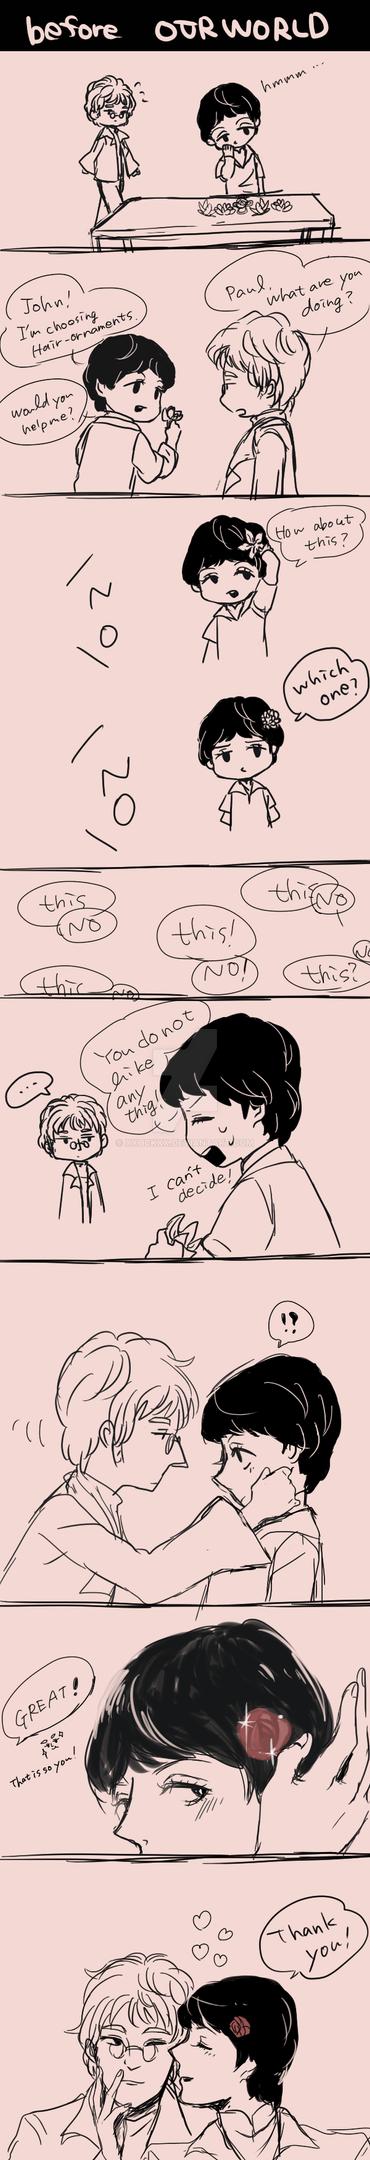 doodle comic by xxHCKxx